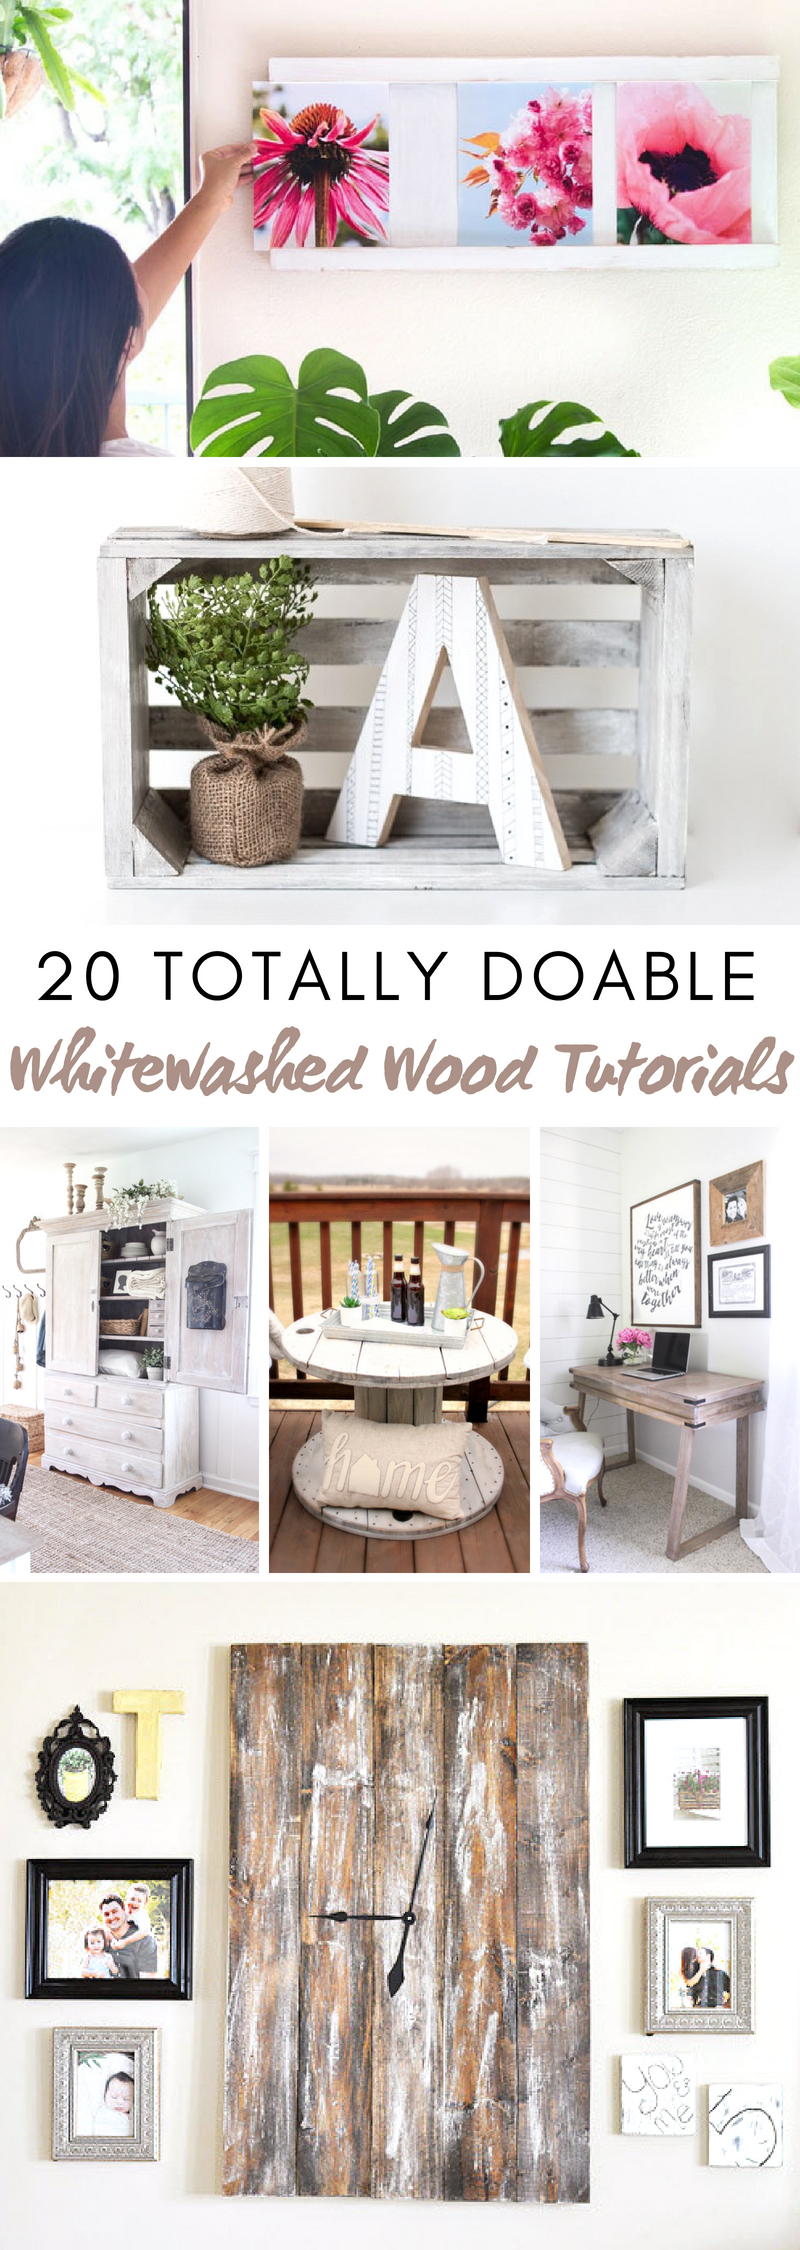 Whitewashed Wood Tutorials